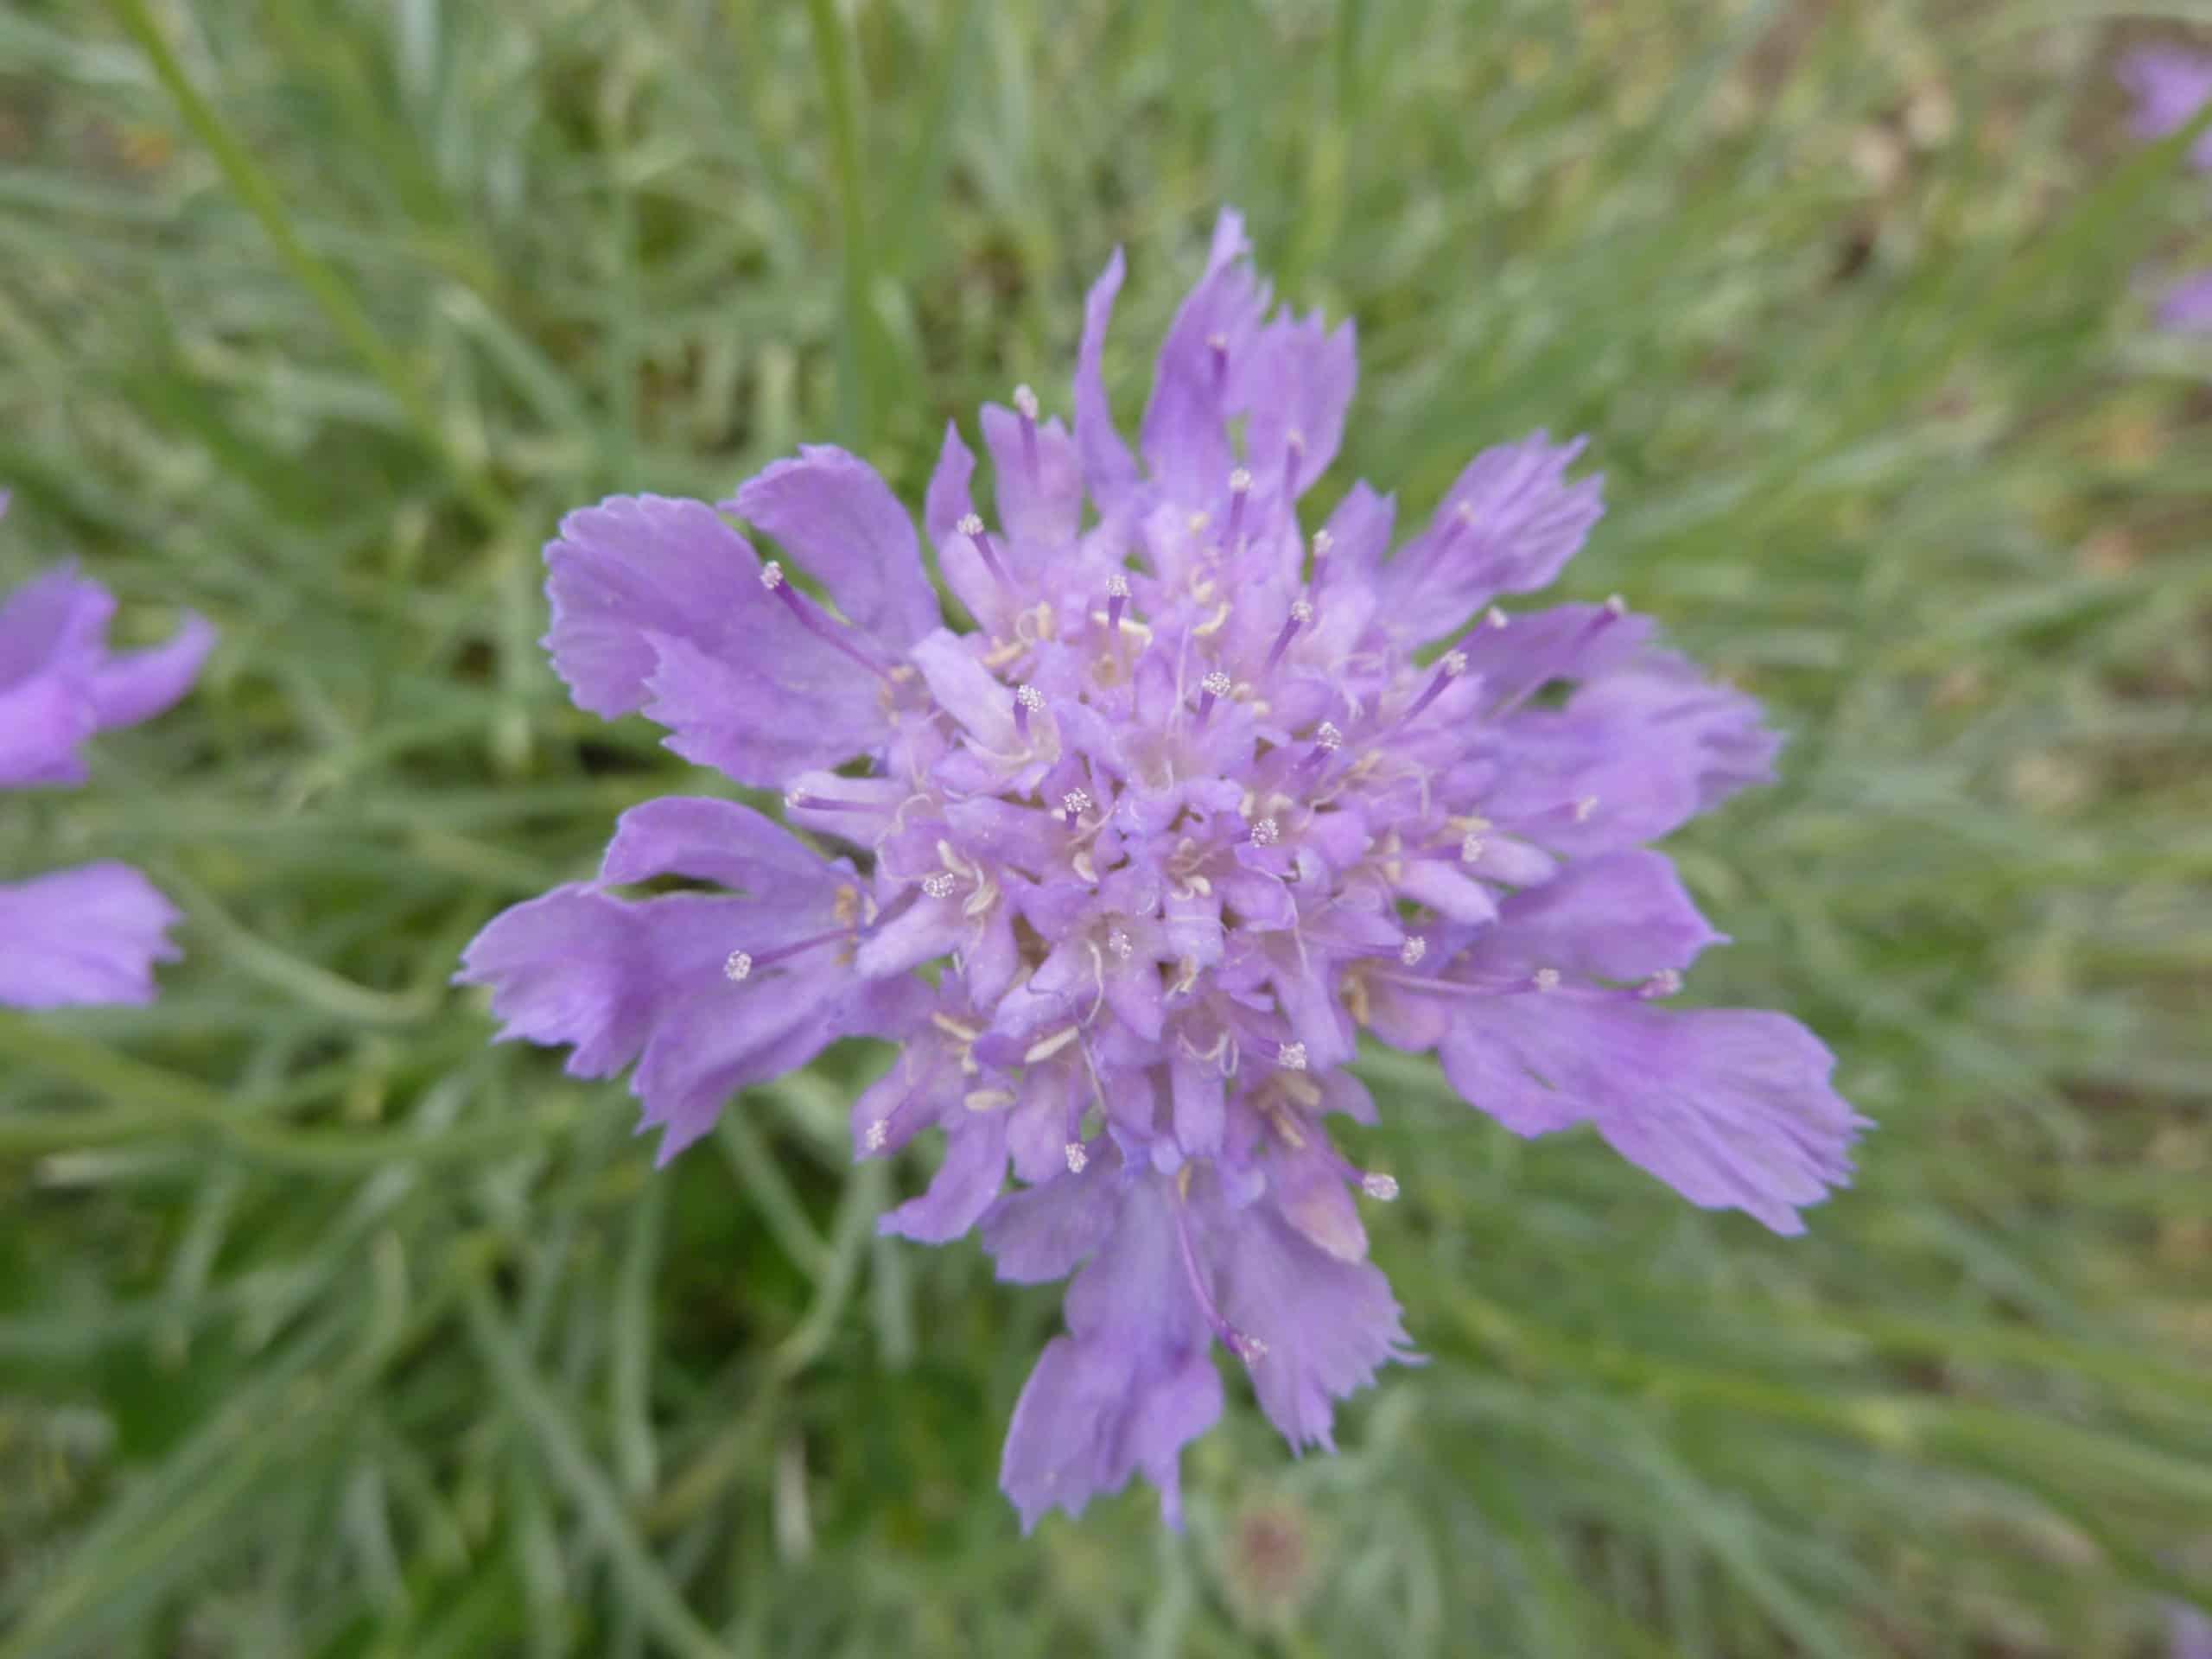 Scabiosa. (Pincushion Flower).